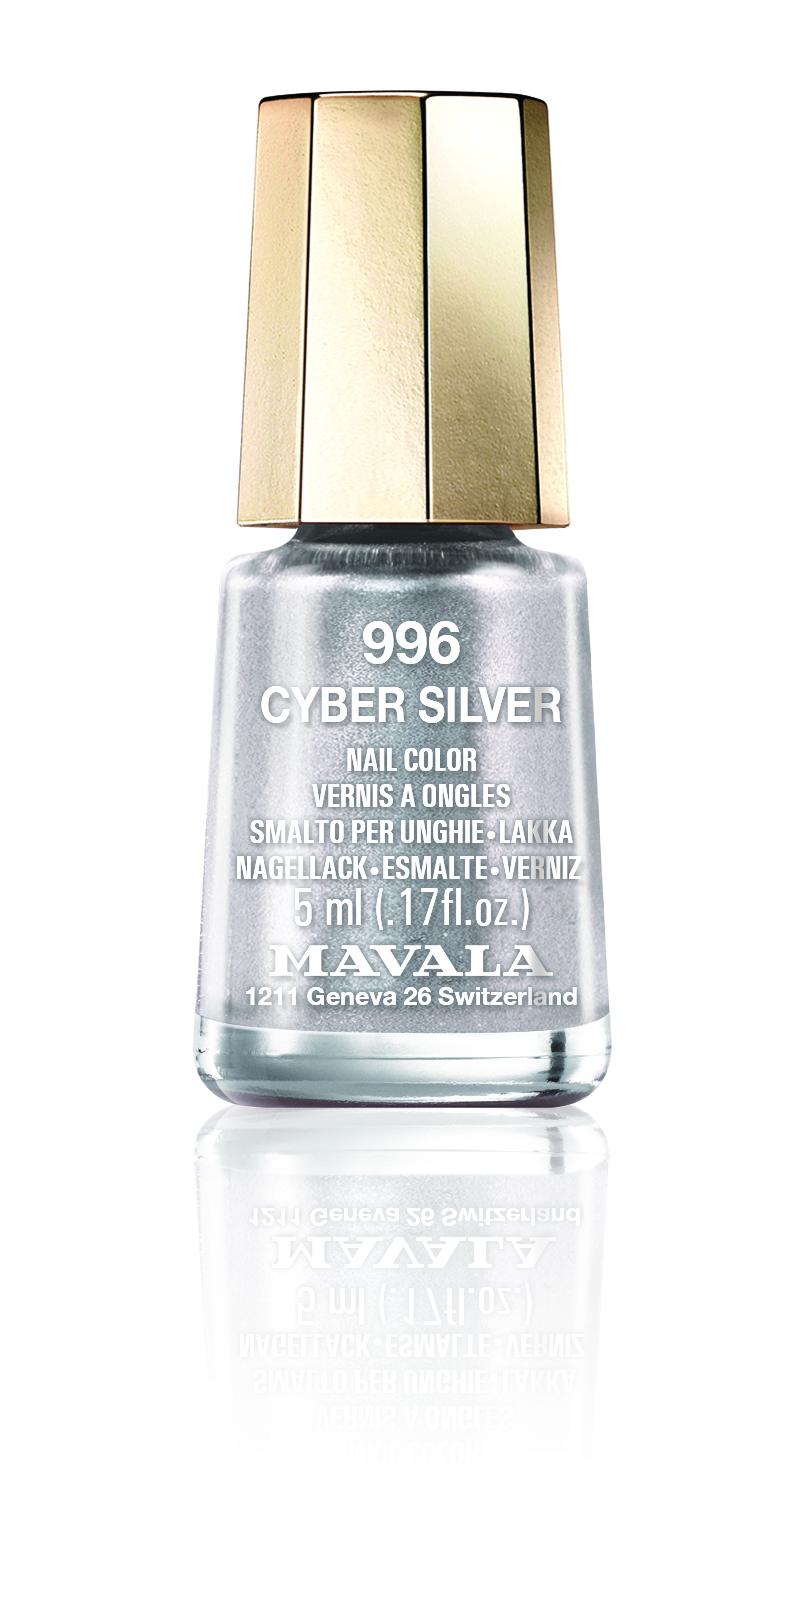 Mavala Minilack Mavala Minilack Cyber Silver 5ml